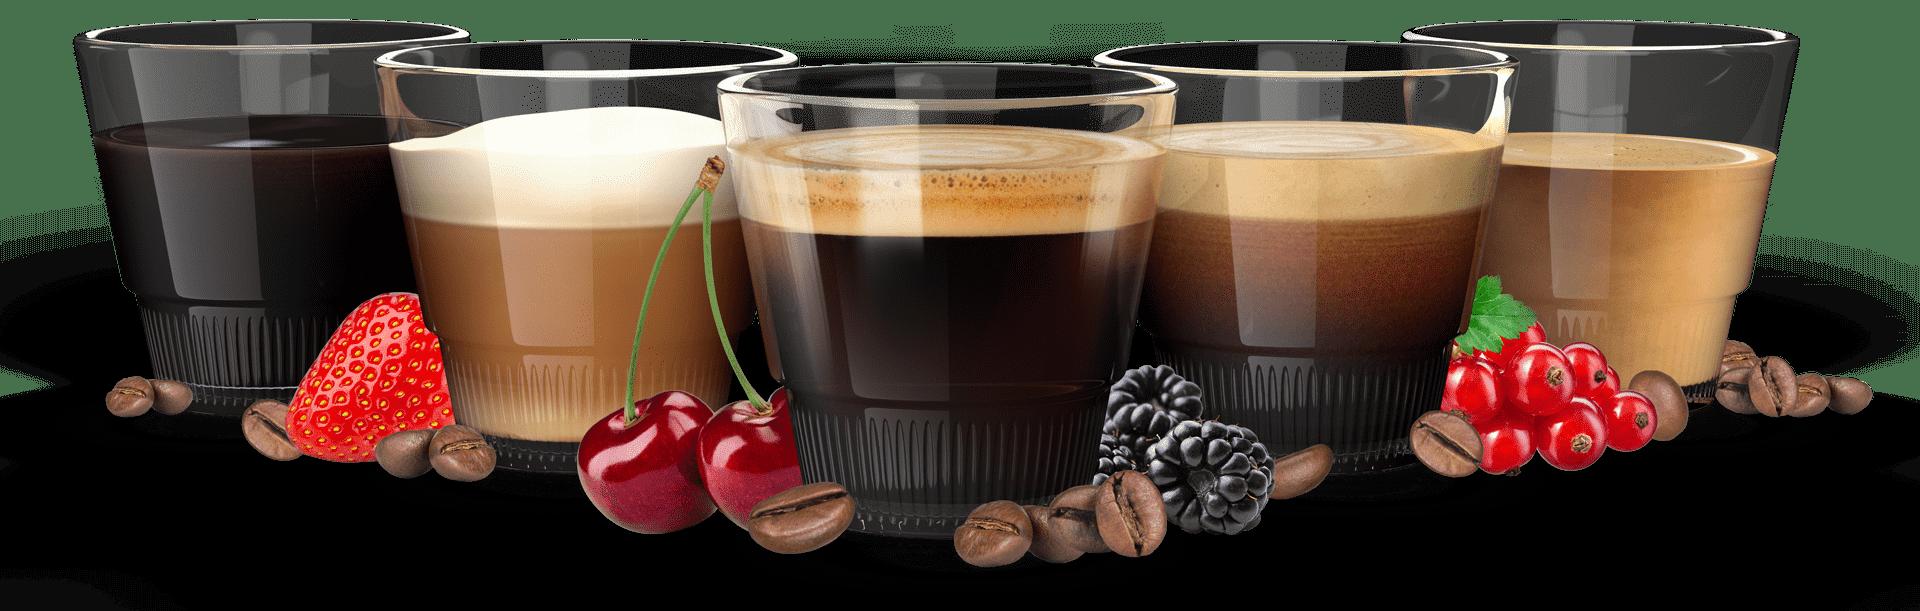 Flatberry Market Kaffee Arten